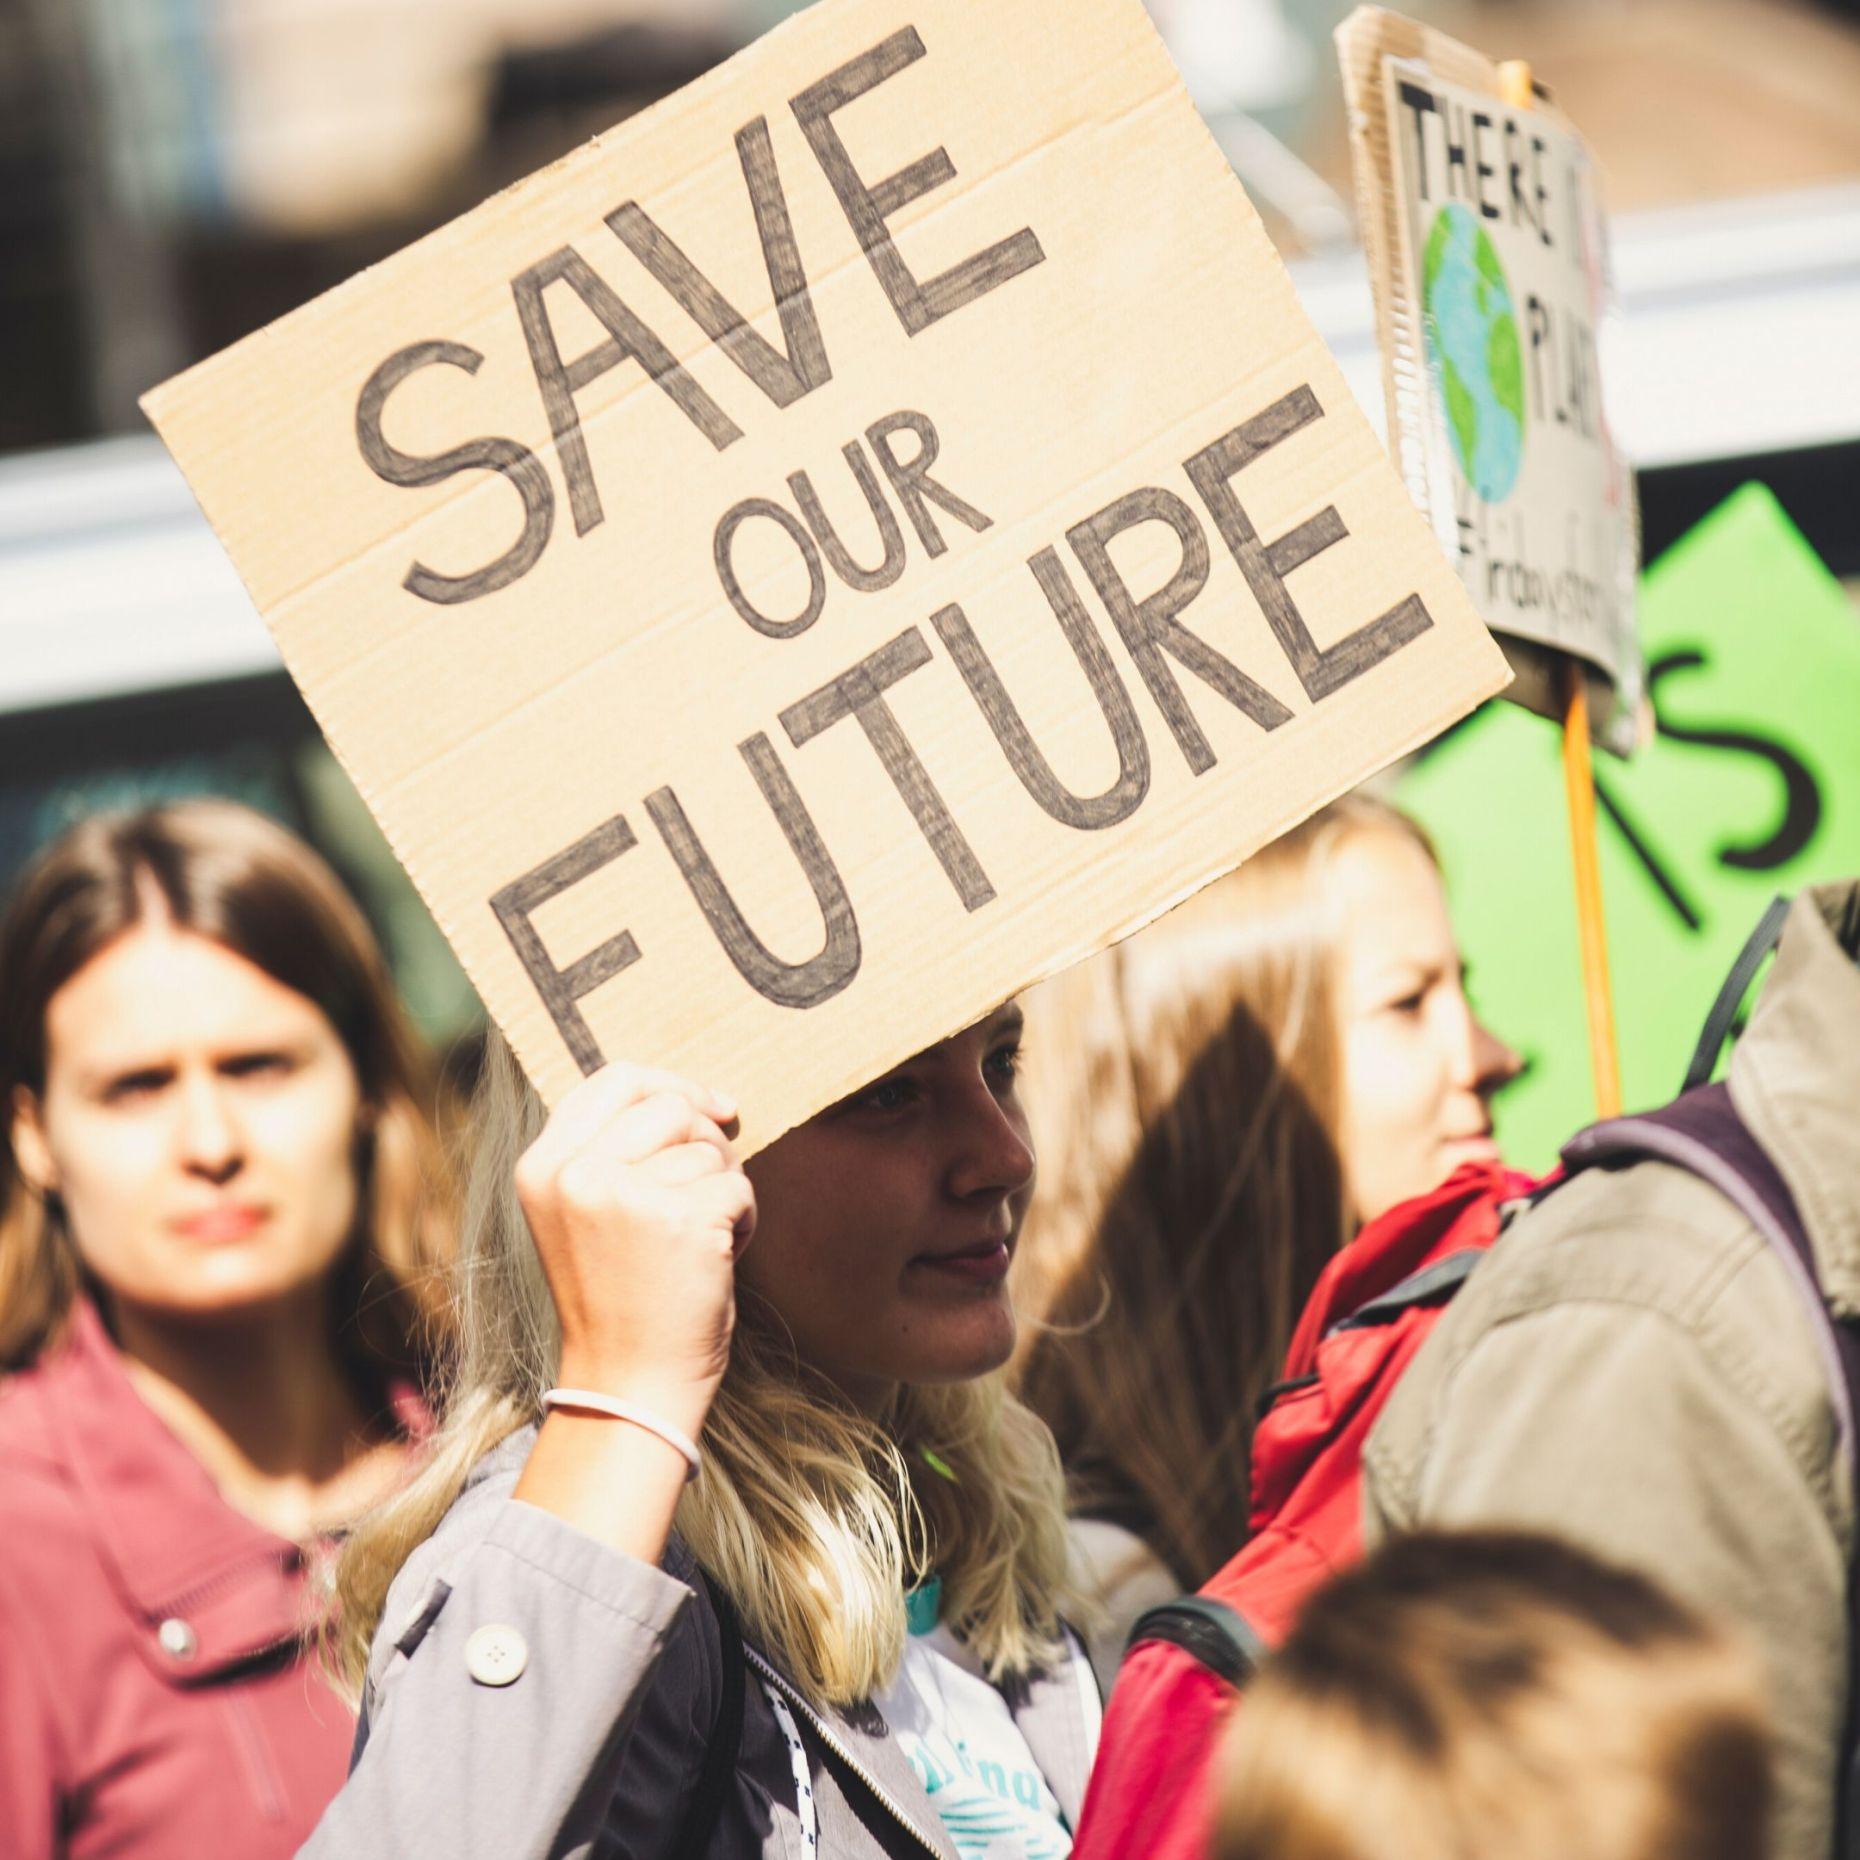 java e peticionit protesta regjistri publik i perdhunuesve